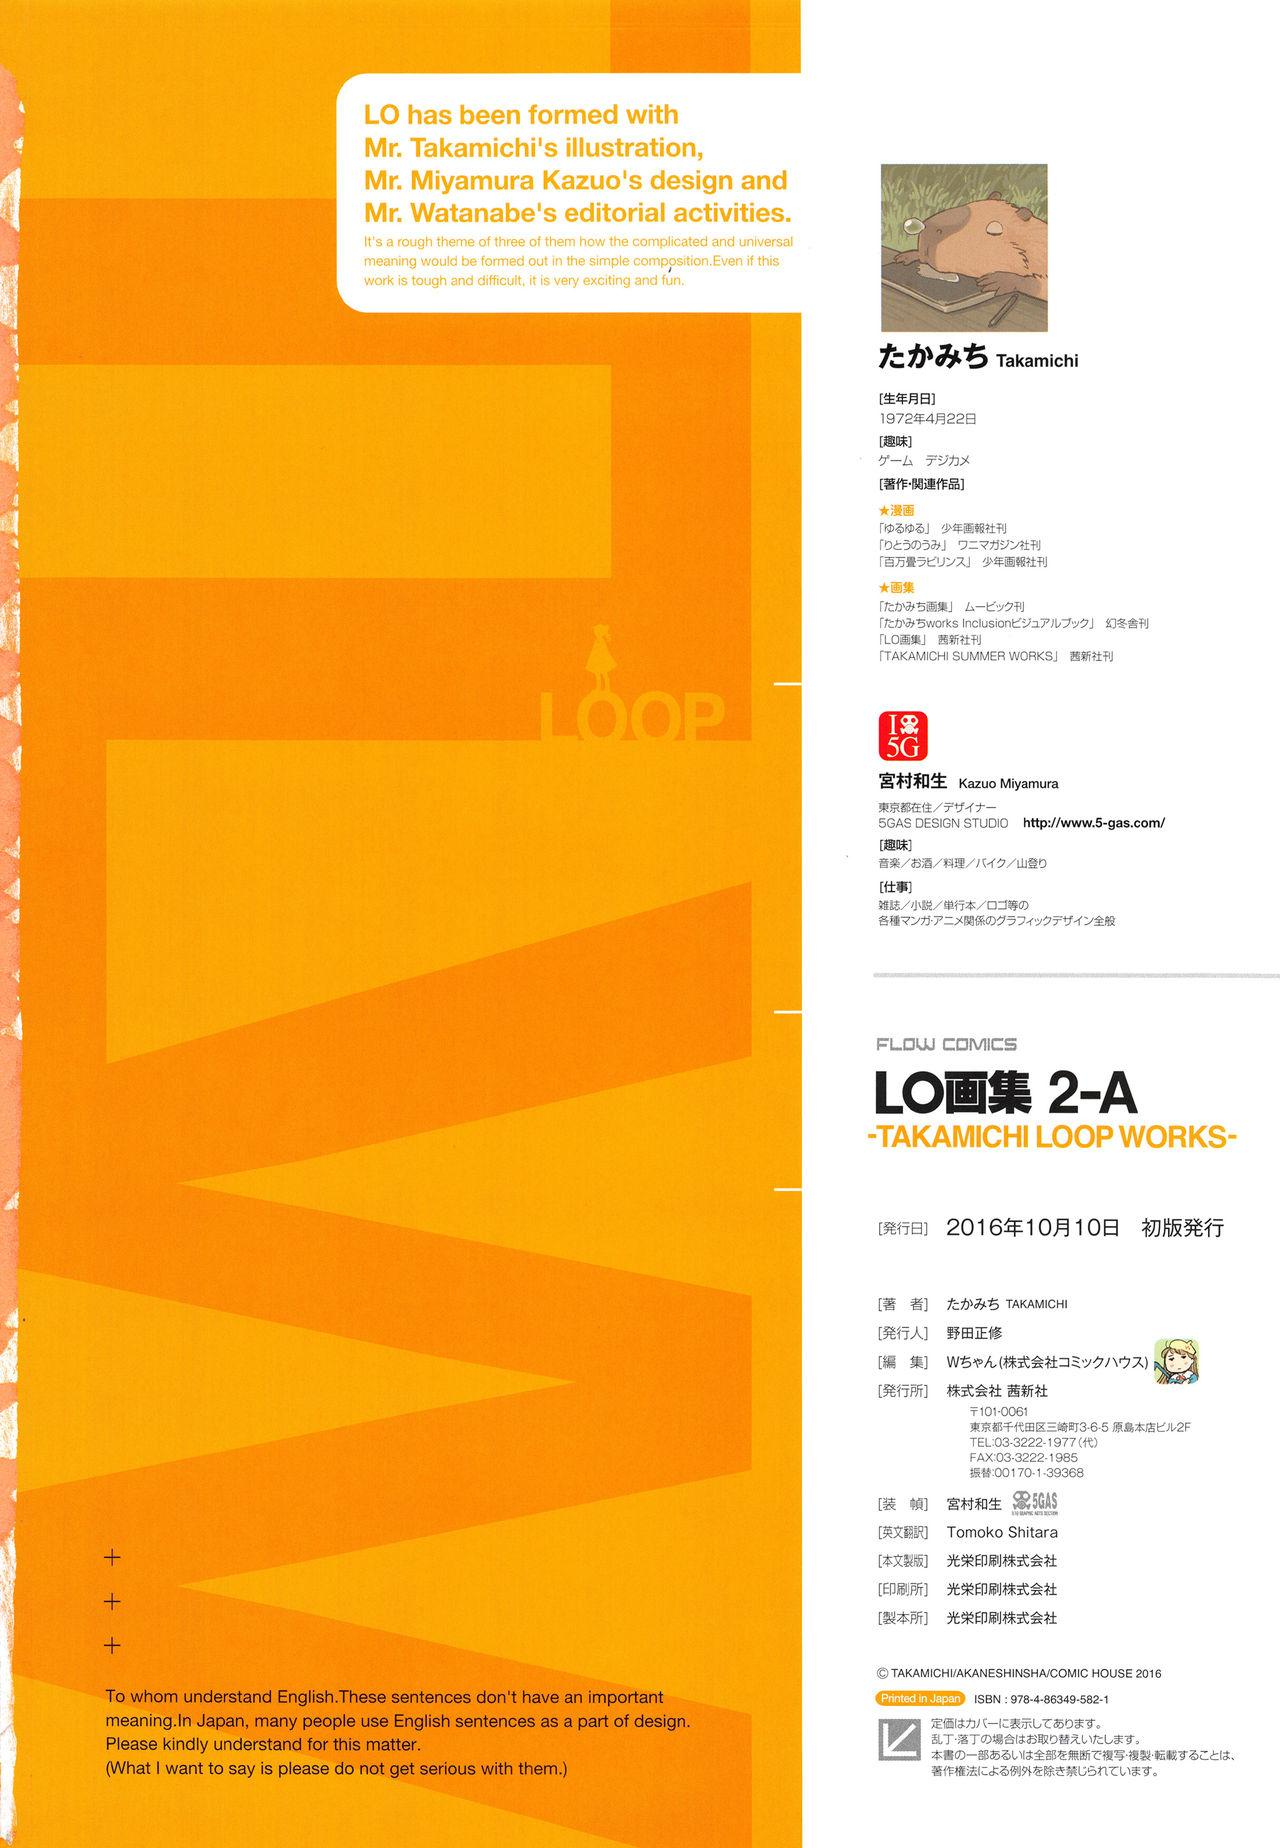 LO Artbook 2-A TAKAMICHI LOOP WORKS 146